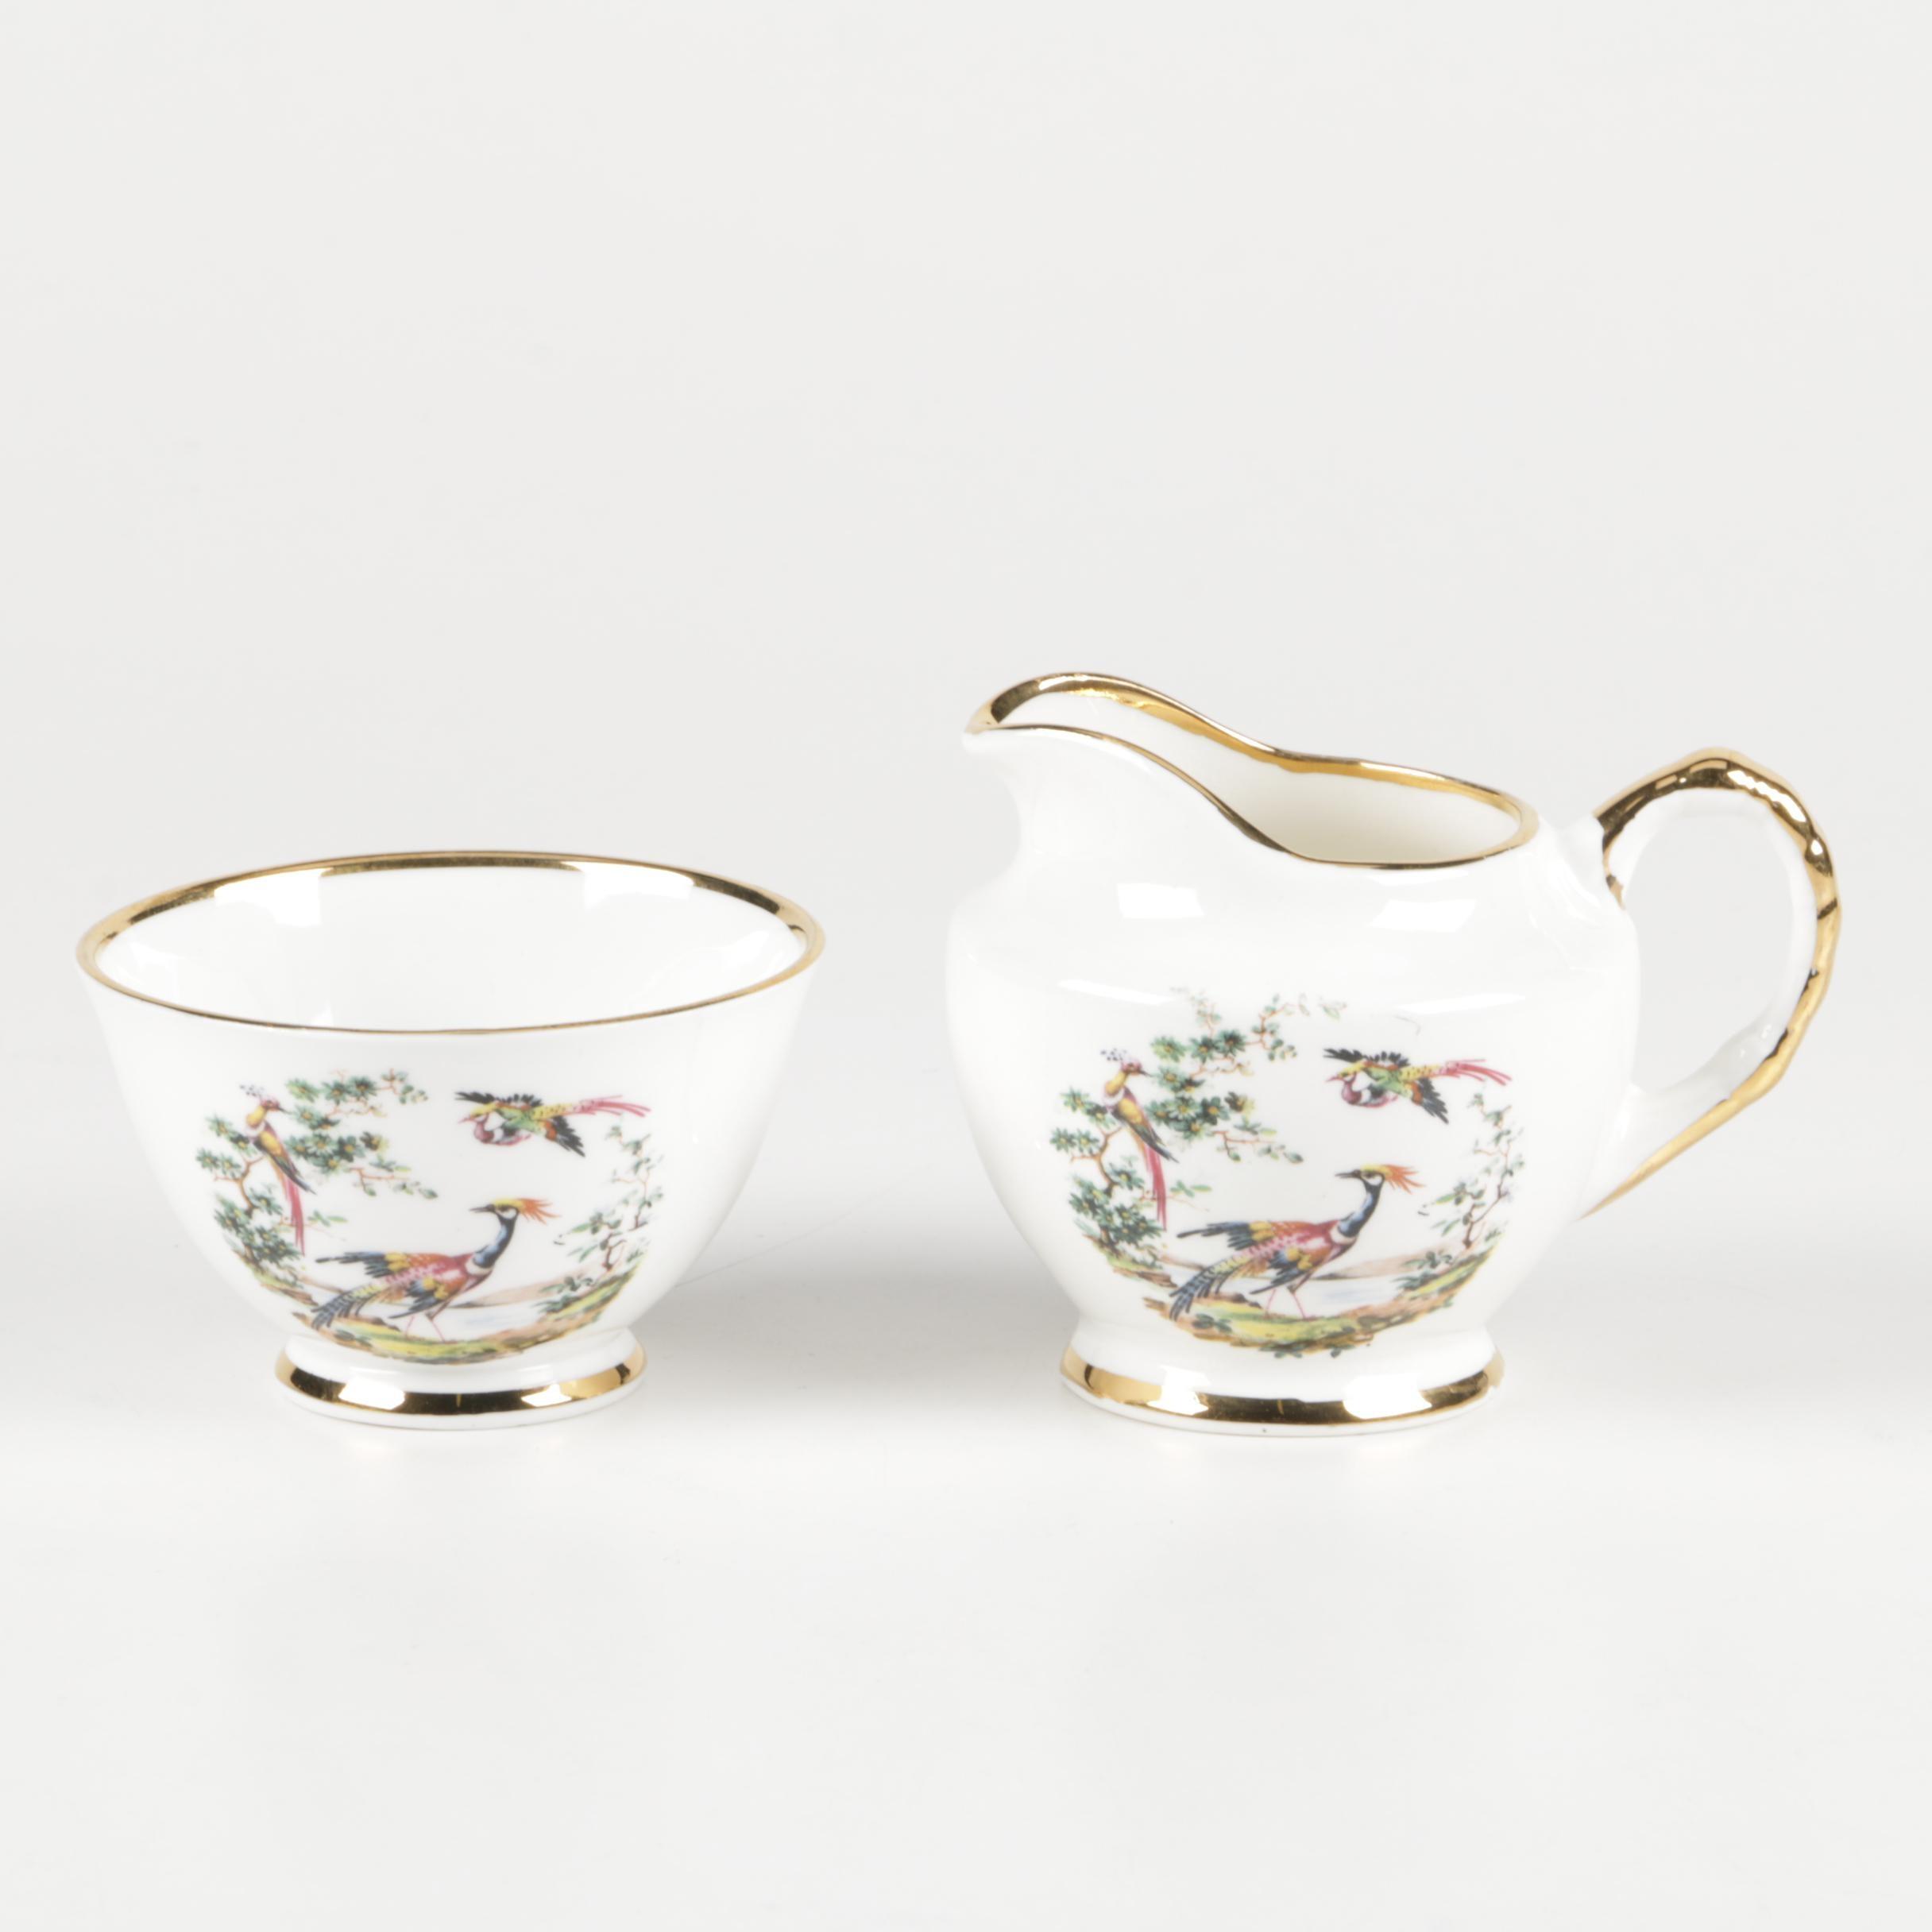 Royal Ardalt Creamer and Sugar Bowl with Birds